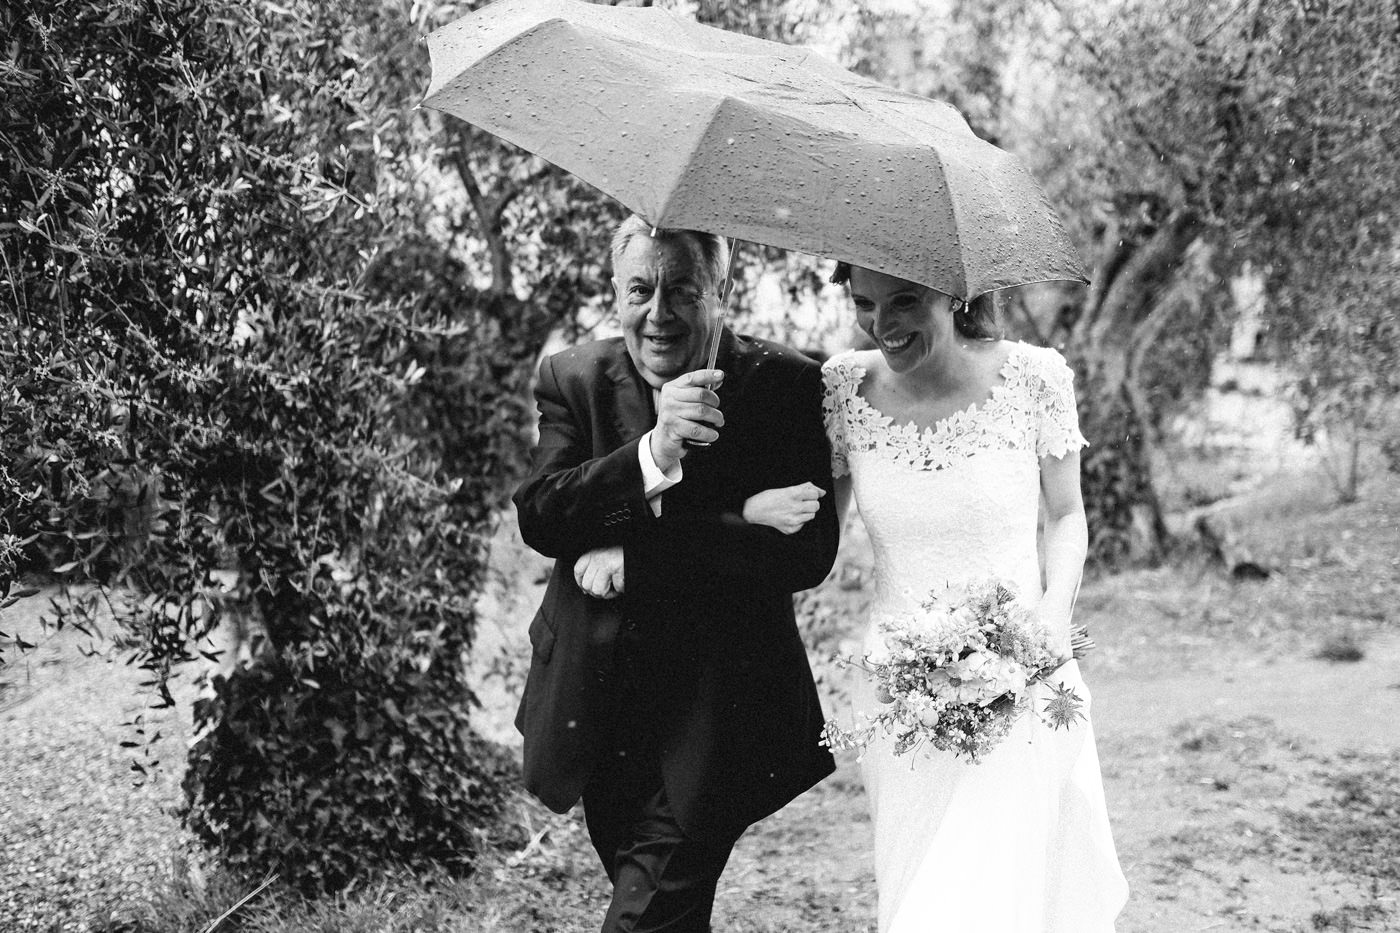 matrimoni_all_italiana_fotografo_matrimonio_toscana-24.jpg